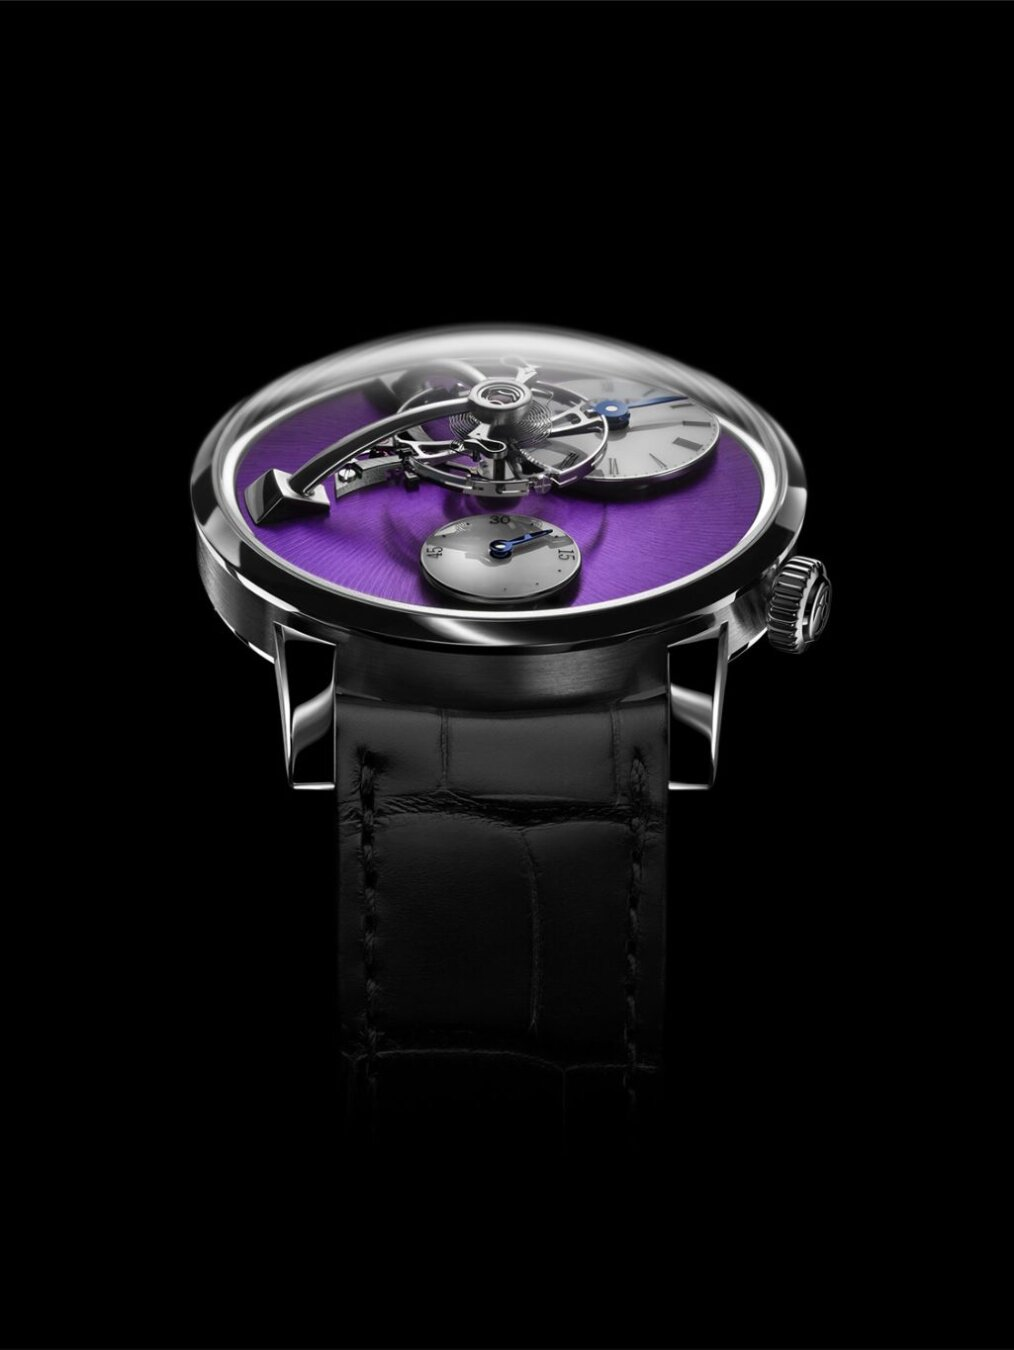 Legacy Machine 101 white gold purple dial